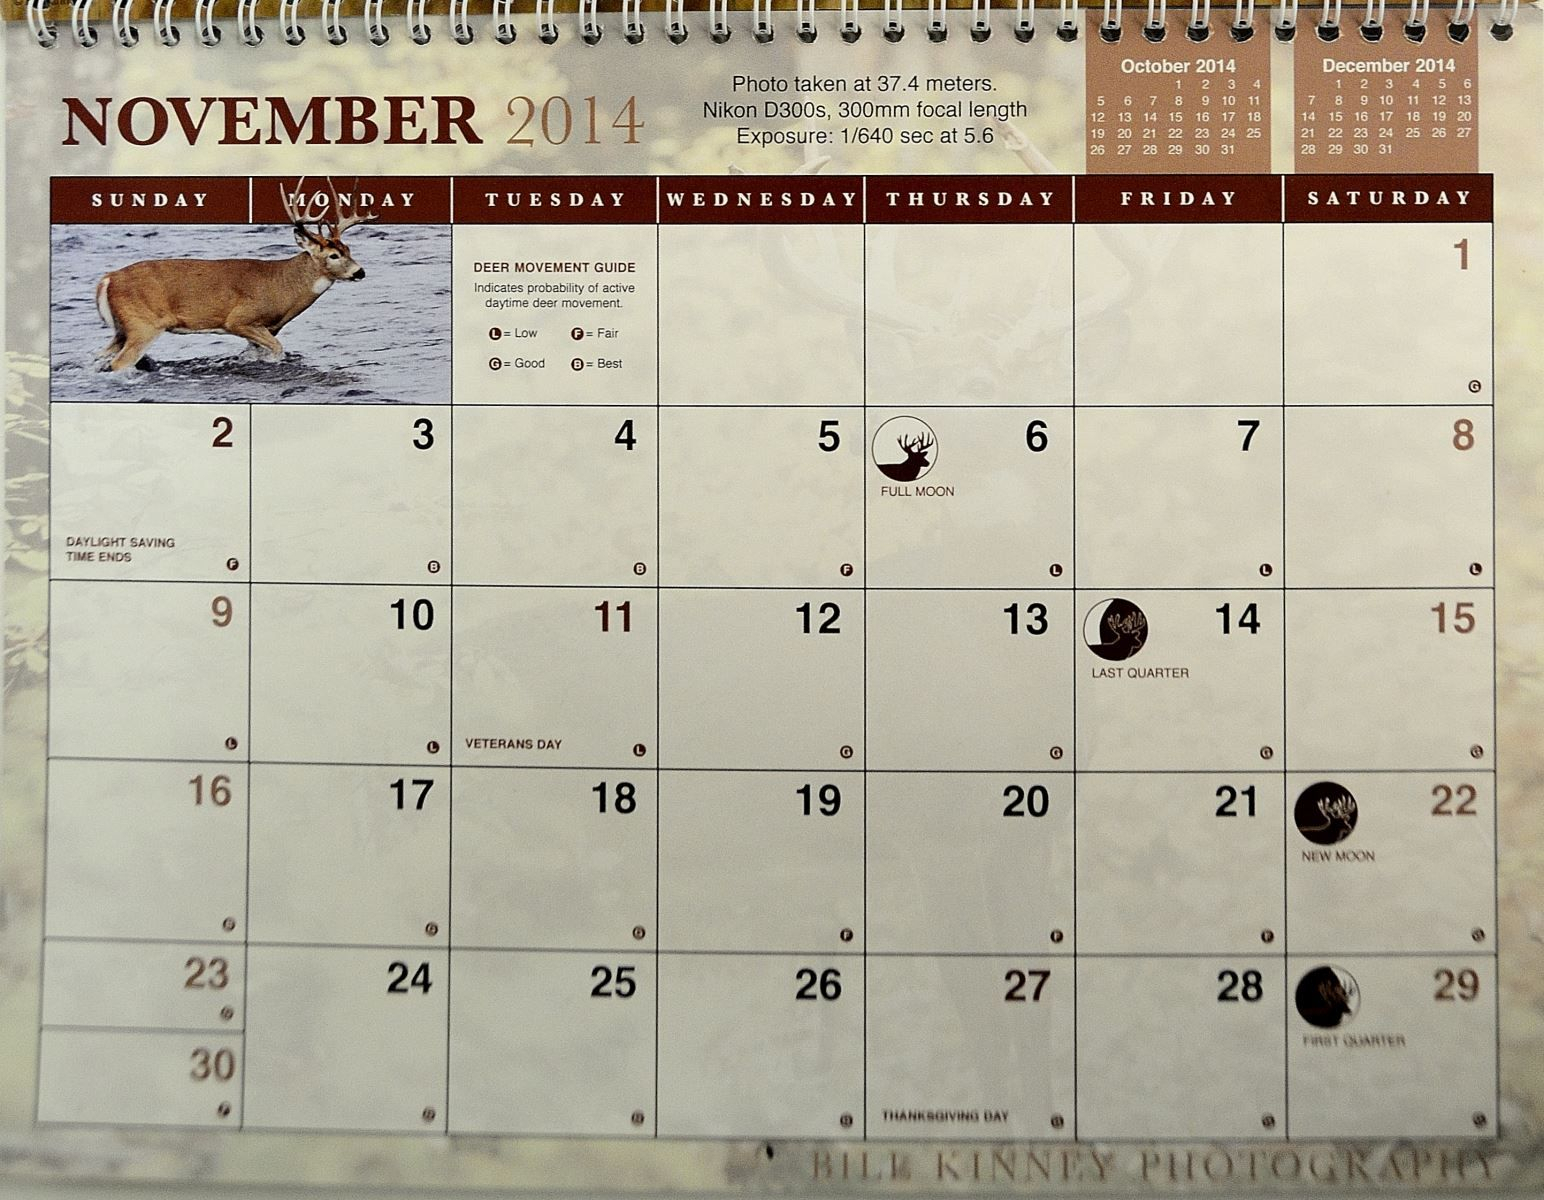 2014 Rut Predictions - Legendary Whitetails | Deer Rut inside Whitetail Deer Rut Calendar